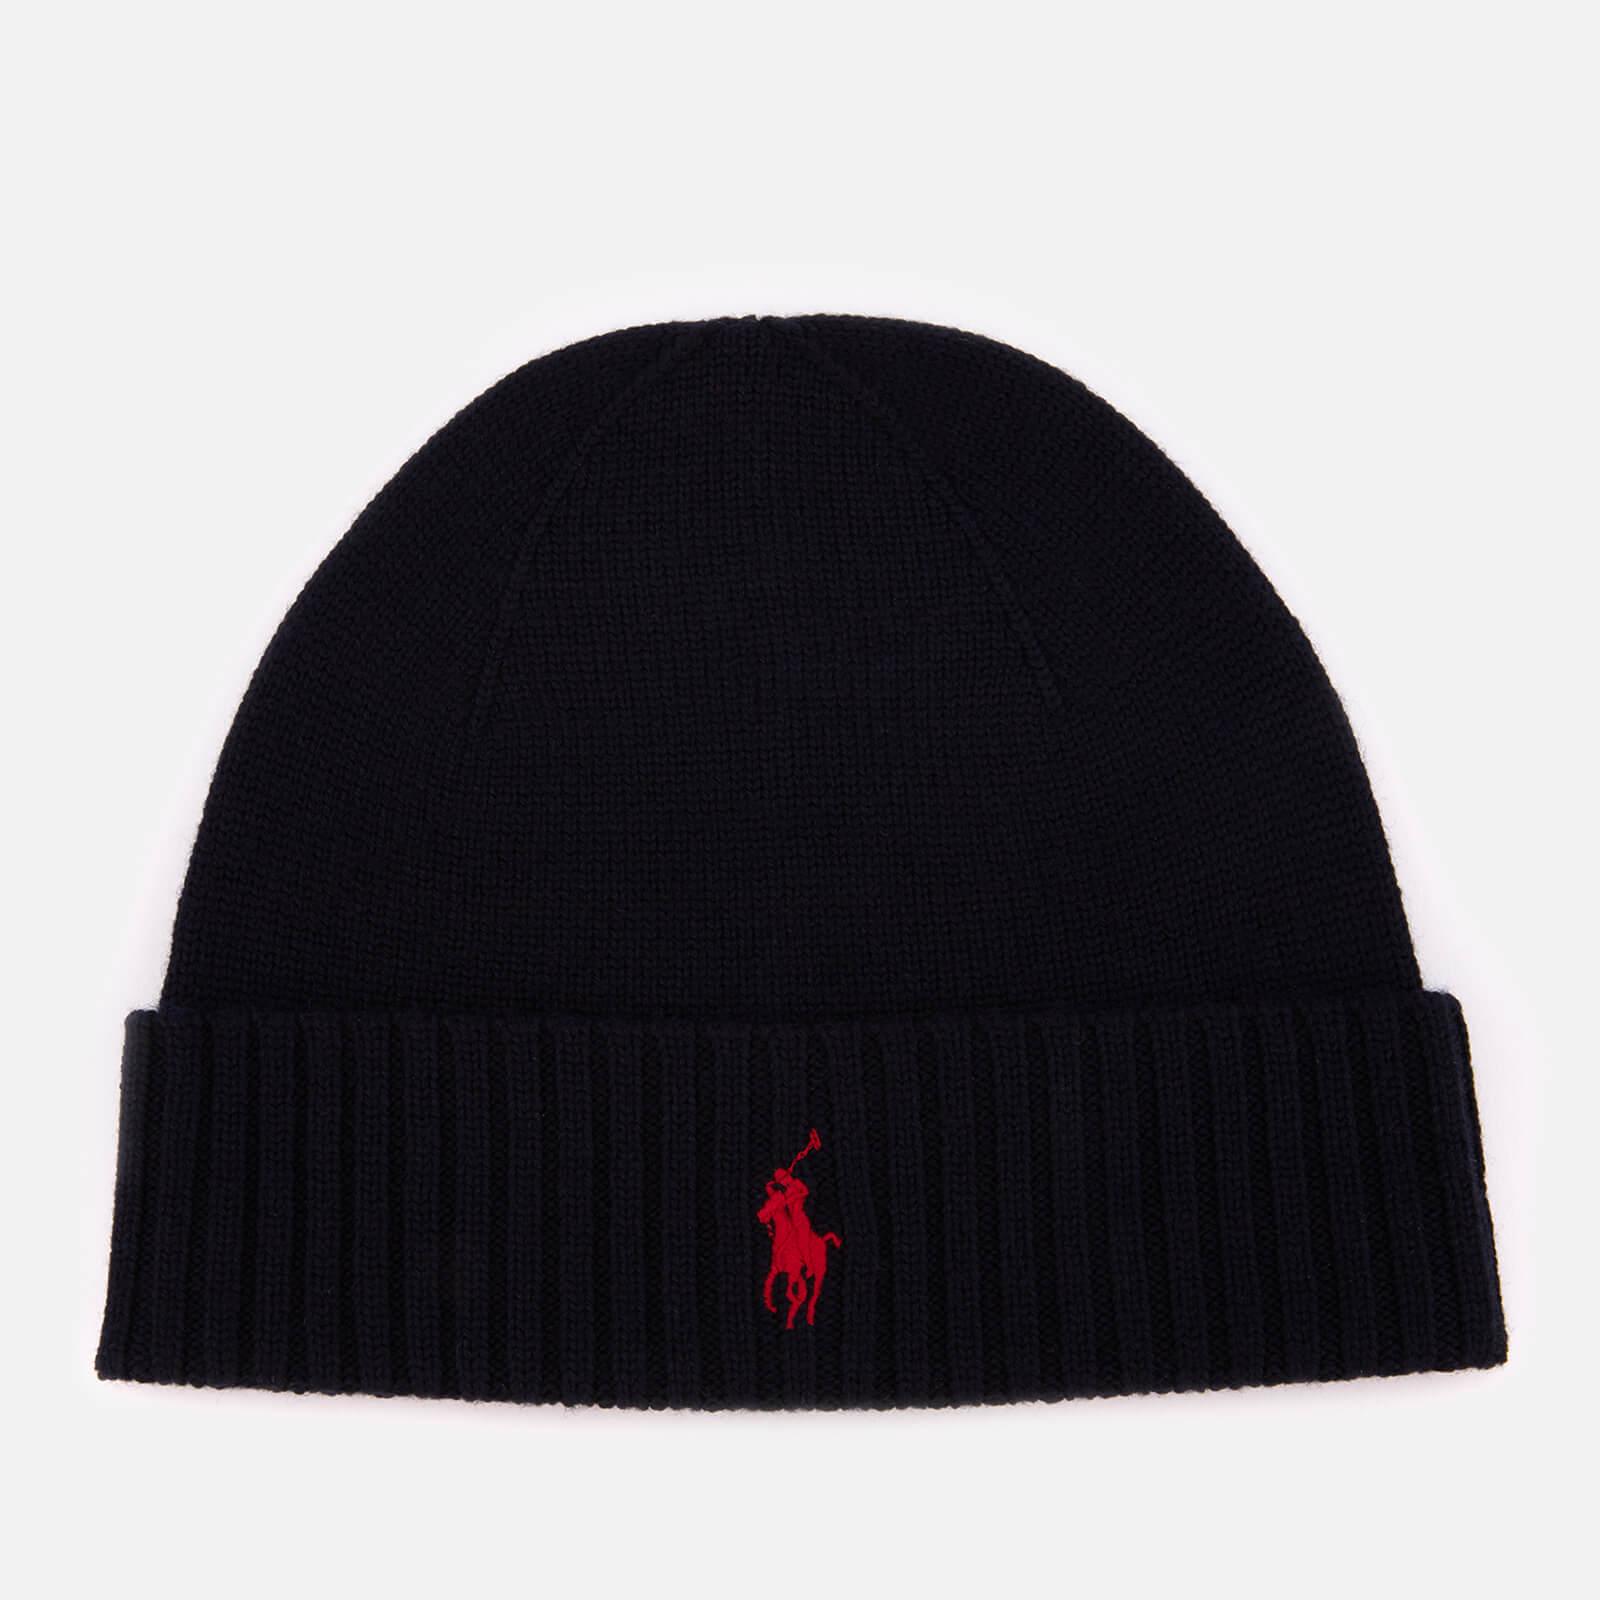 122204716f8 Polo Ralph Lauren Men s Merino Wool Beanie Hat - Hunter Navy - Free UK  Delivery over £50